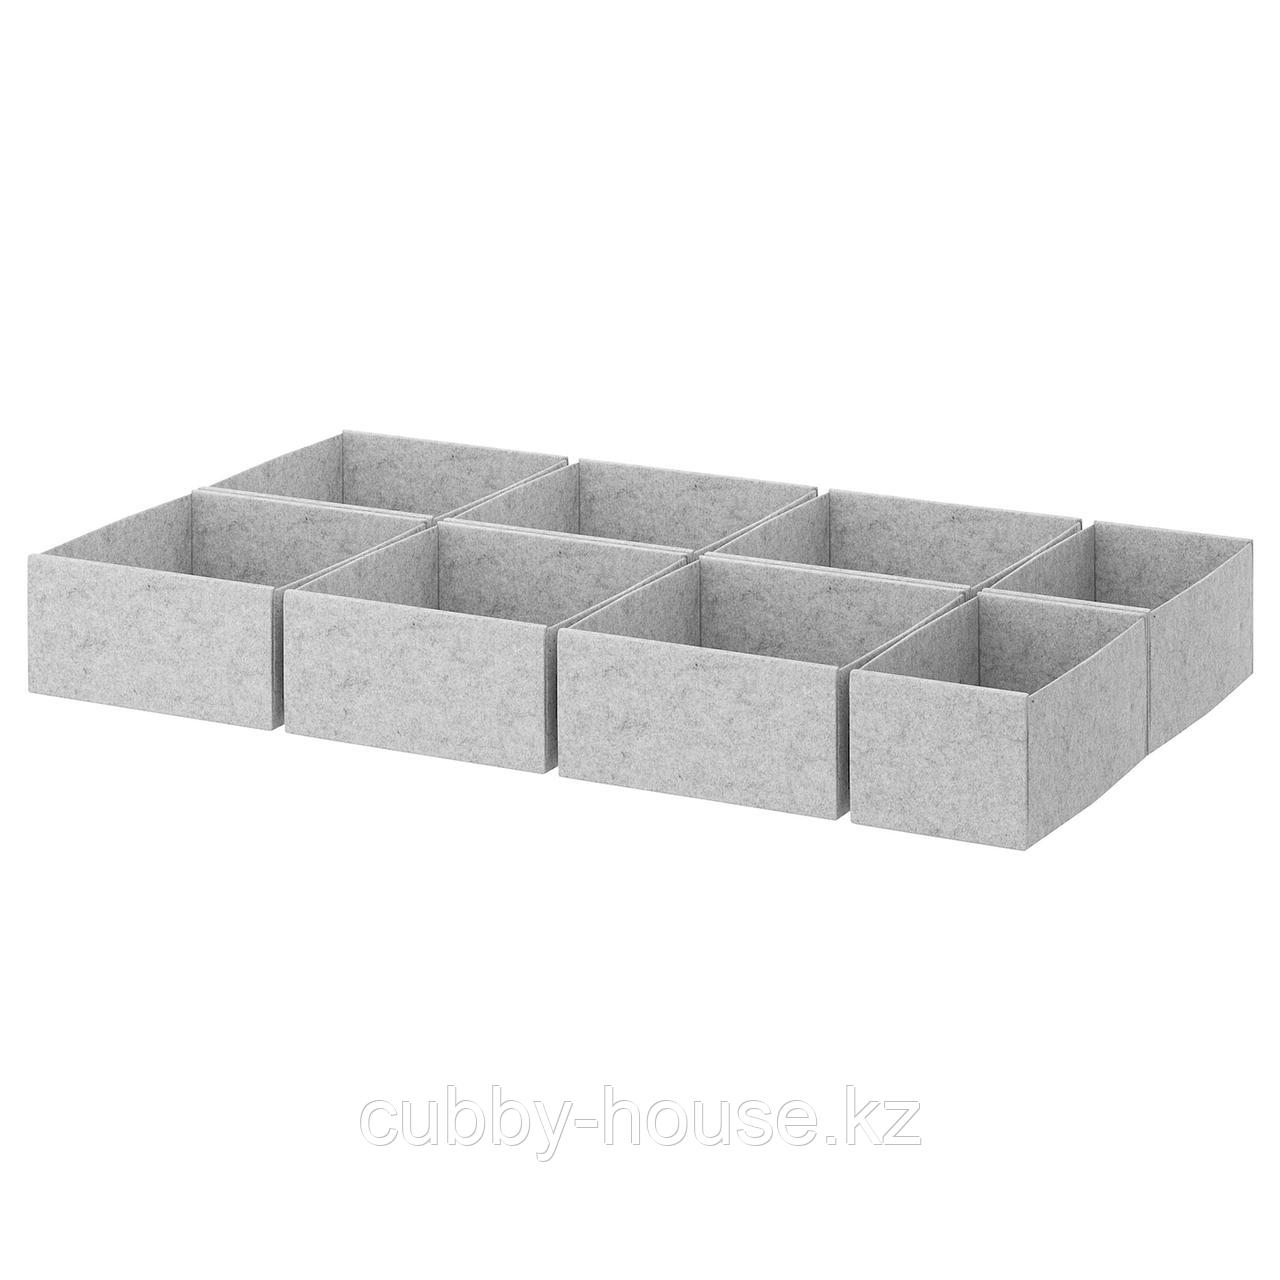 КОМПЛИМЕНТ Коробка, 8 шт., светло-серый, 100x58 см